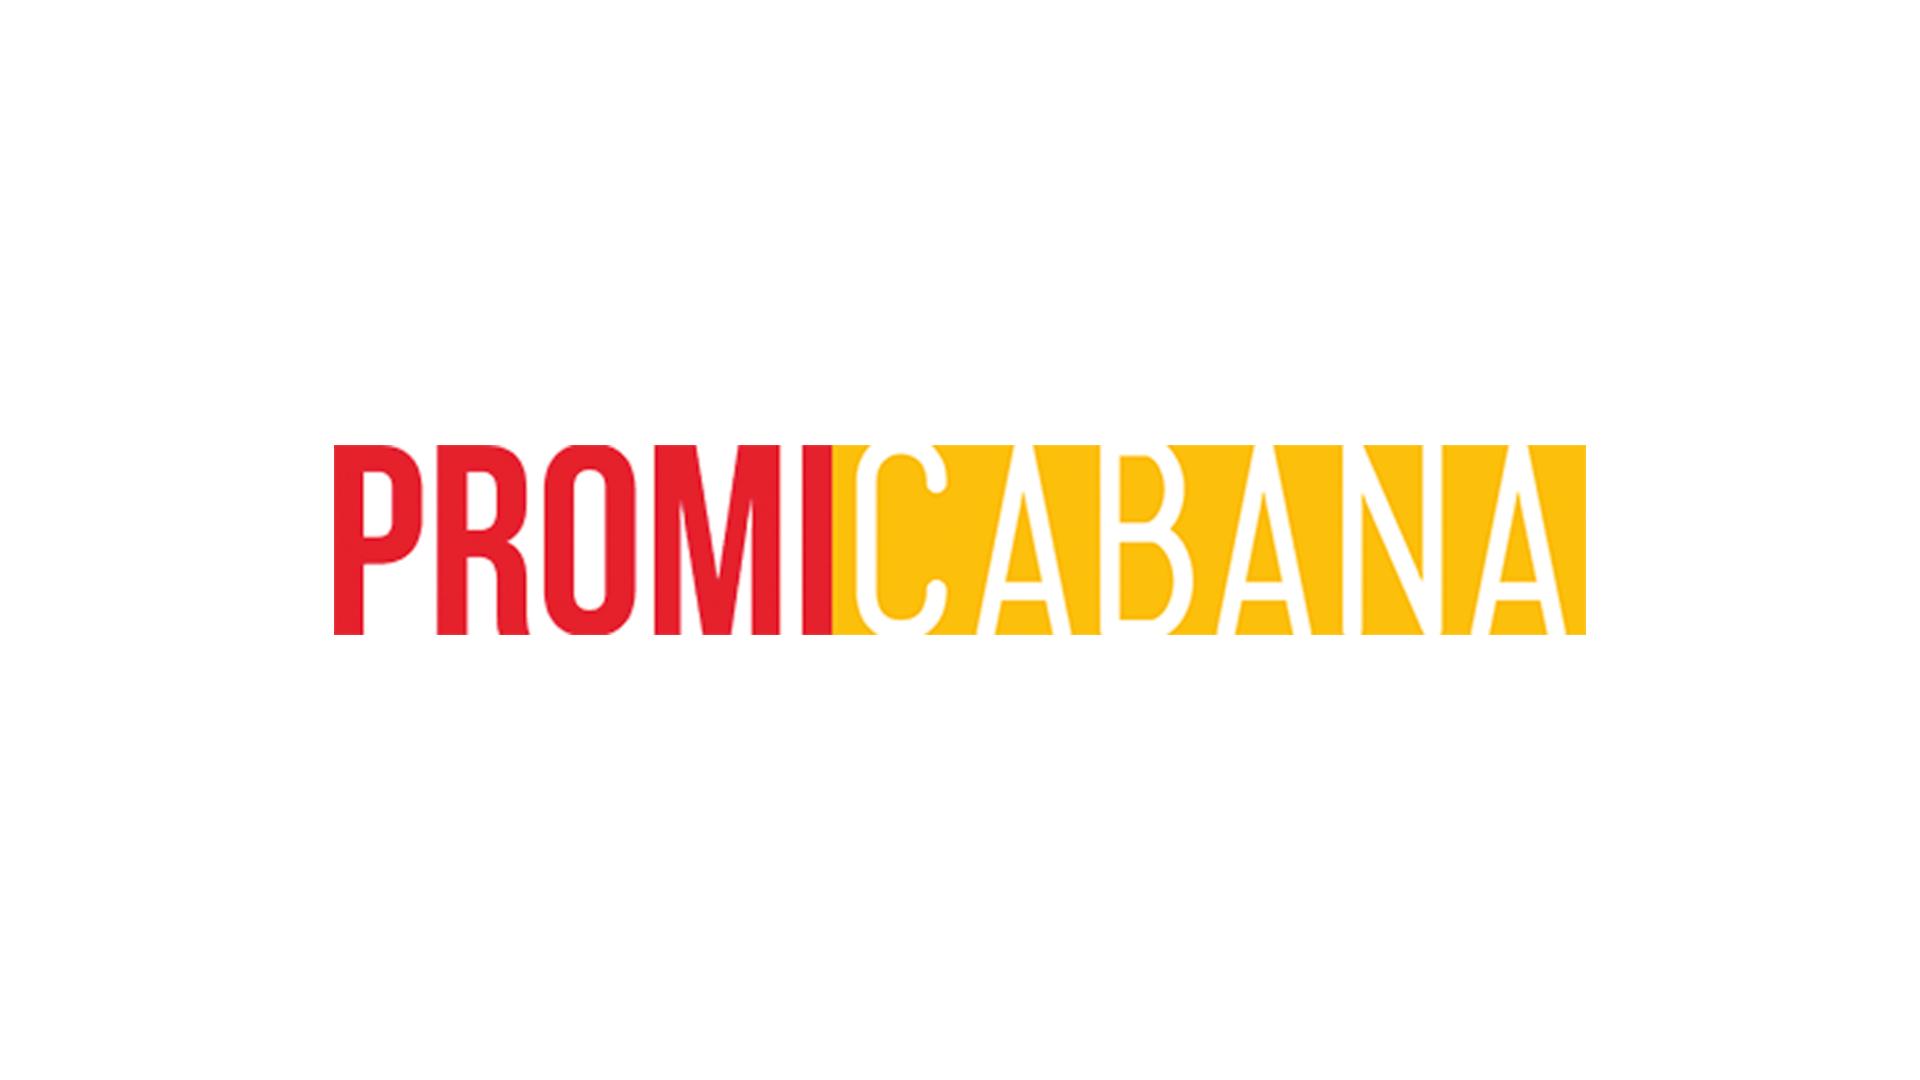 Megan-Fox-Leslie-Mann-This-Is-40